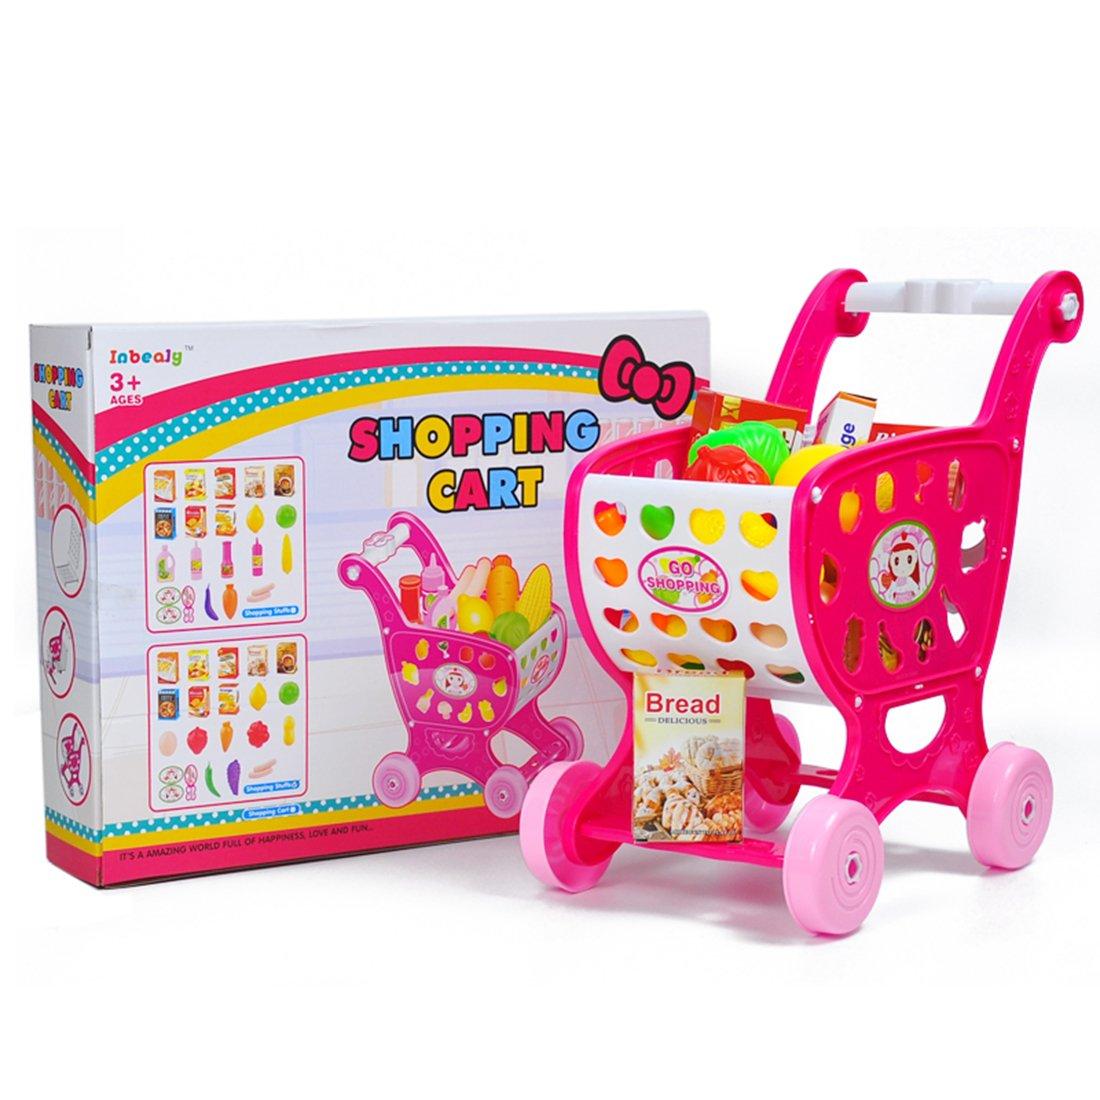 Shopping Cart for Kids PINCHUANGHUI 19Pcs Children Shopping Cart Toys Set Pretend Play Baby Kids Home Educational Toy - Pink   B075NY1BRB